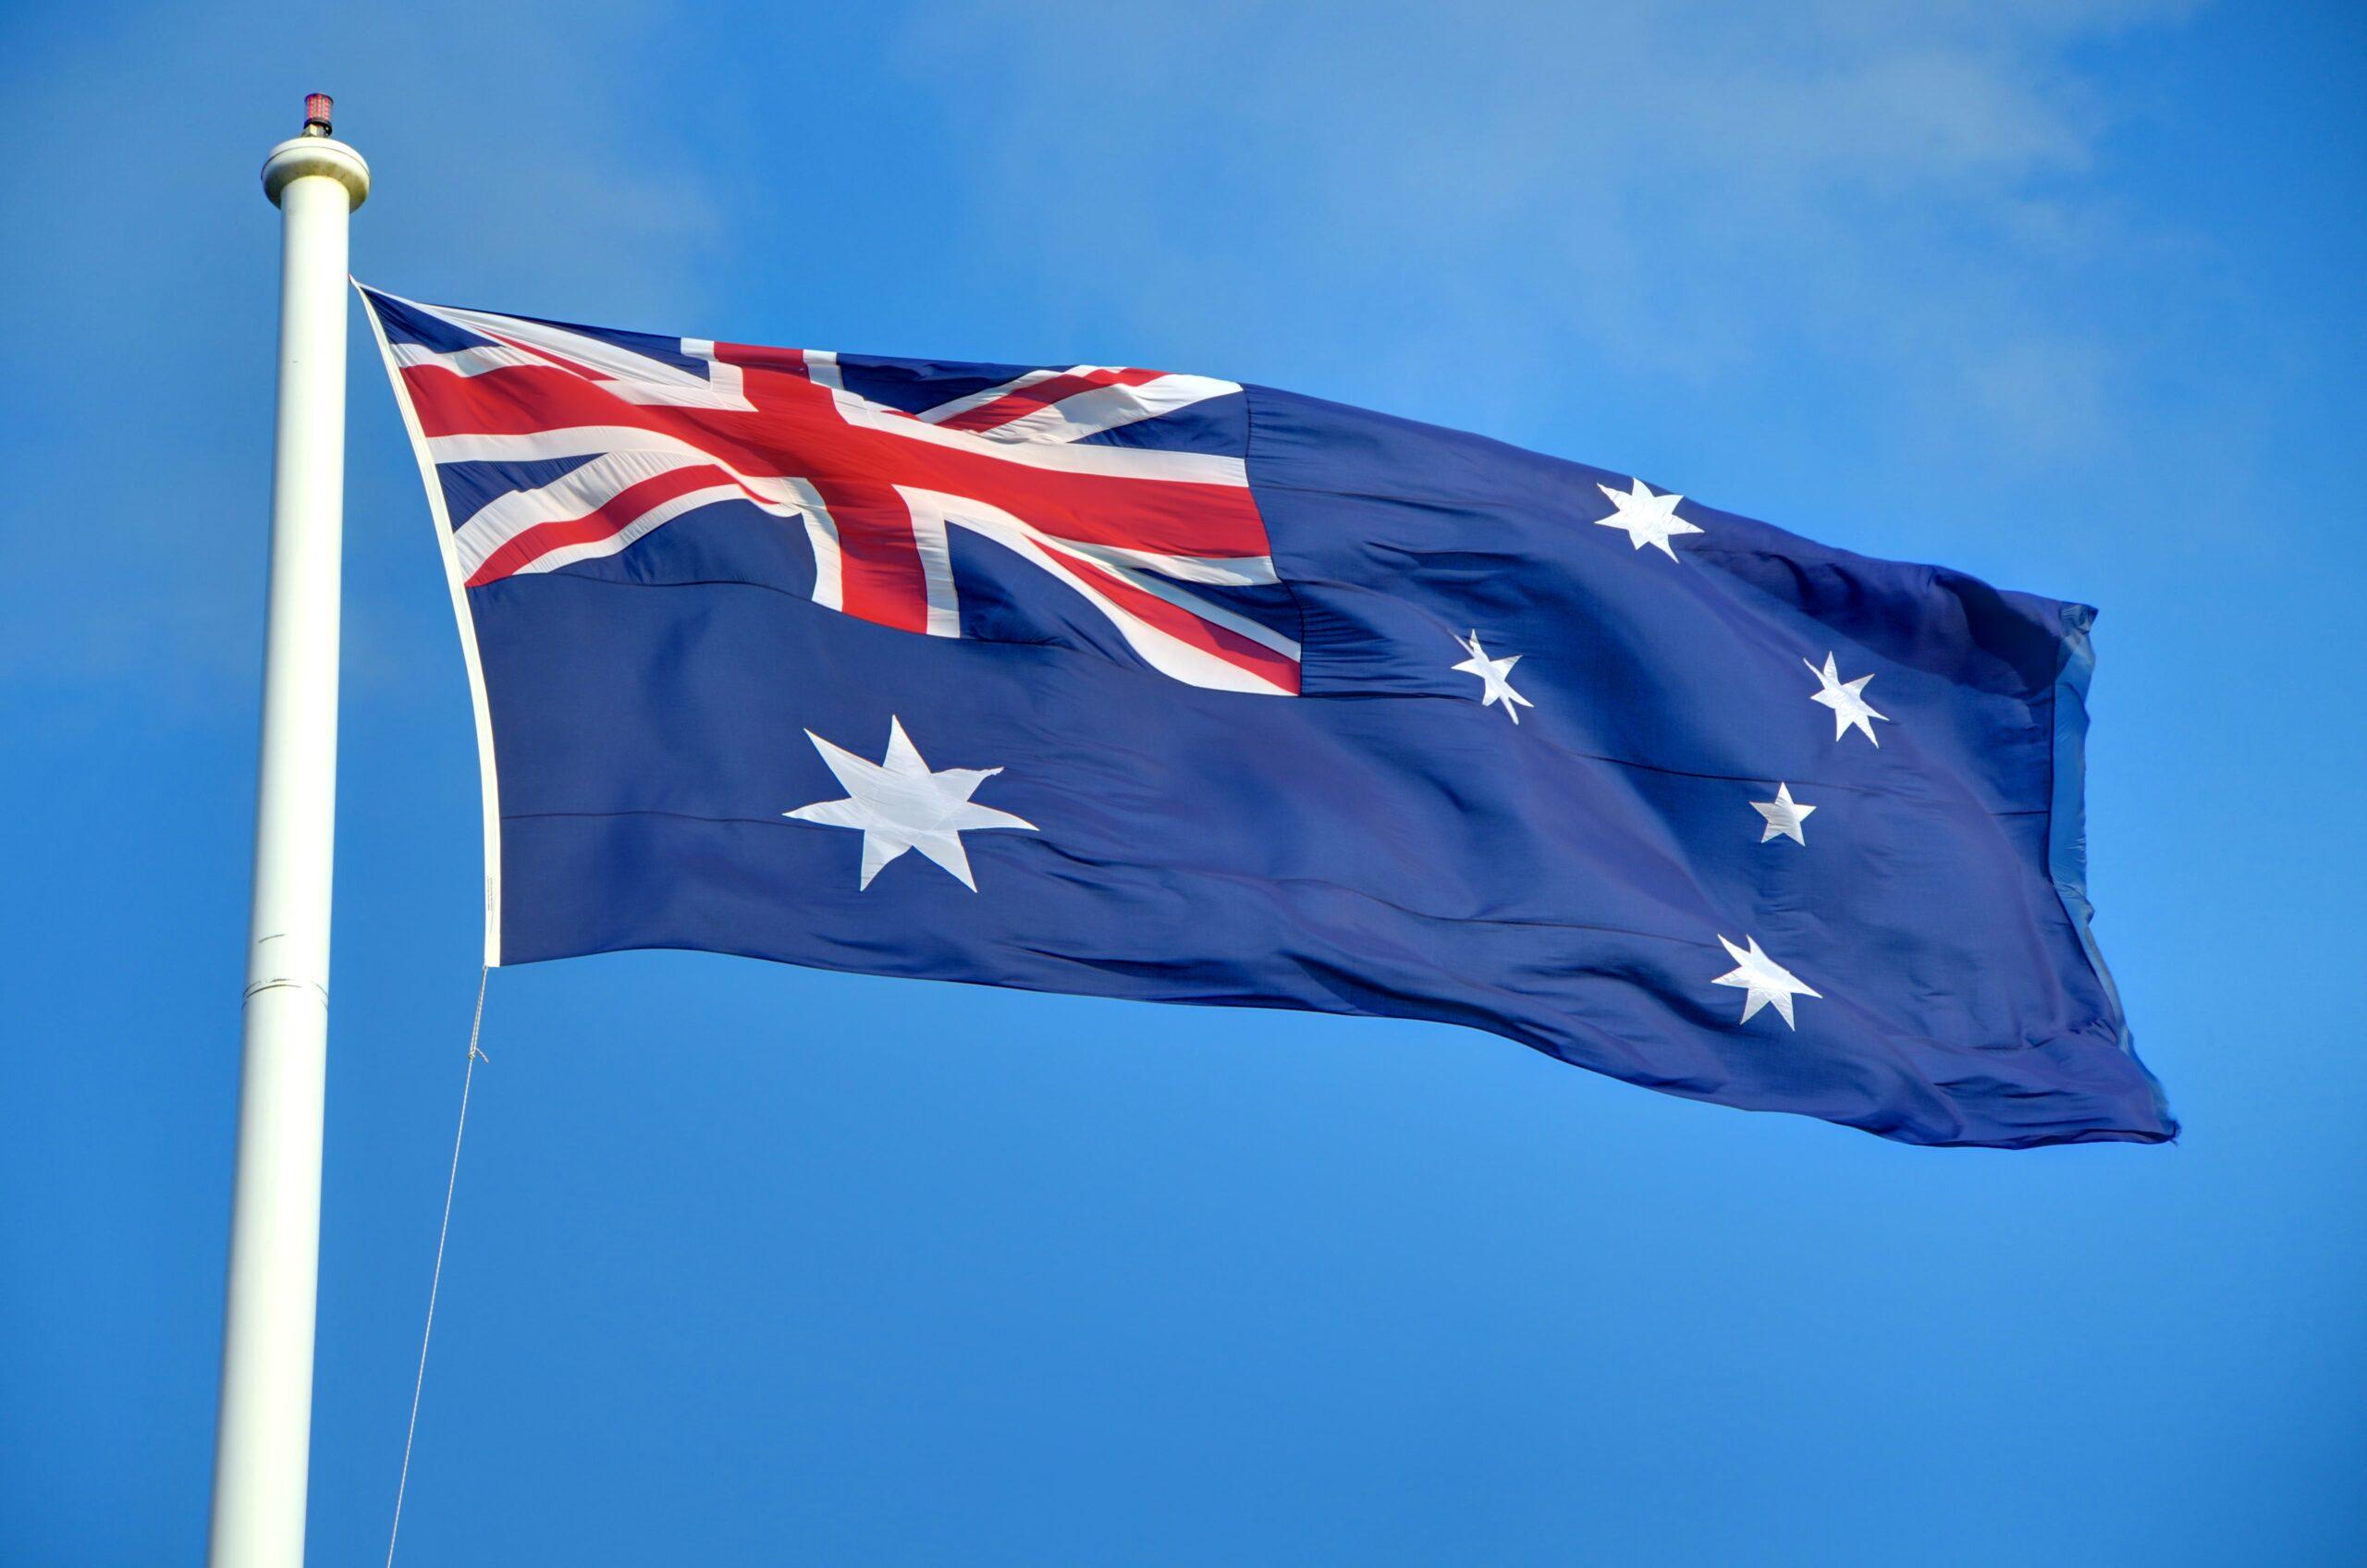 42 cursos online gratuitos de universidades australianas